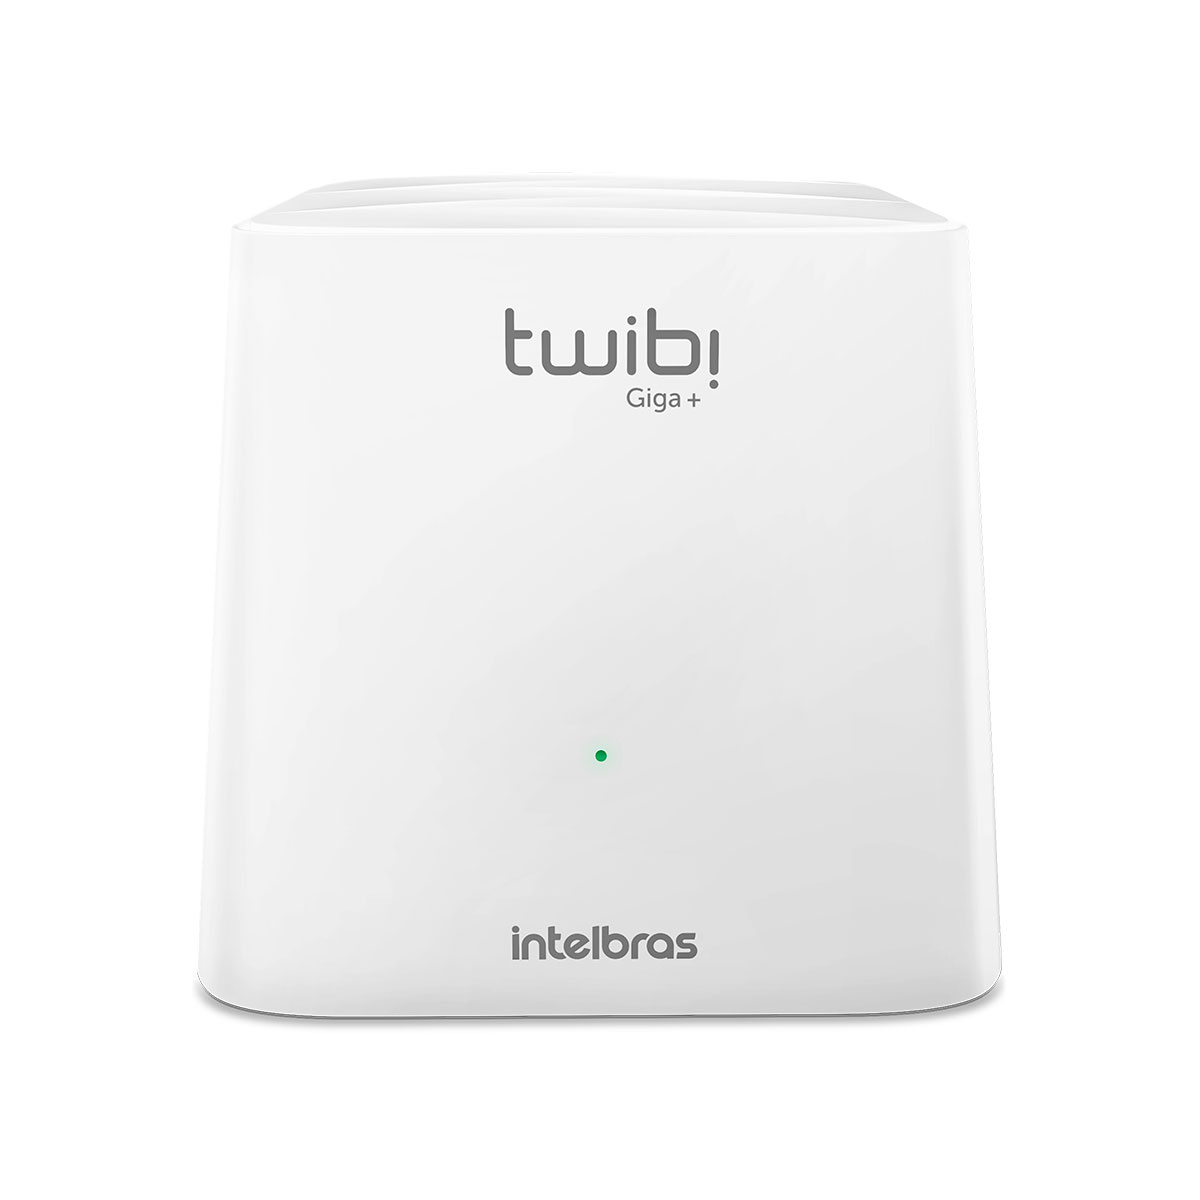 ROTEADOR MESH TWIBI GIGA+ AC1200 DUAL BAND UNIDADE 4750078  - Audio Video & cia